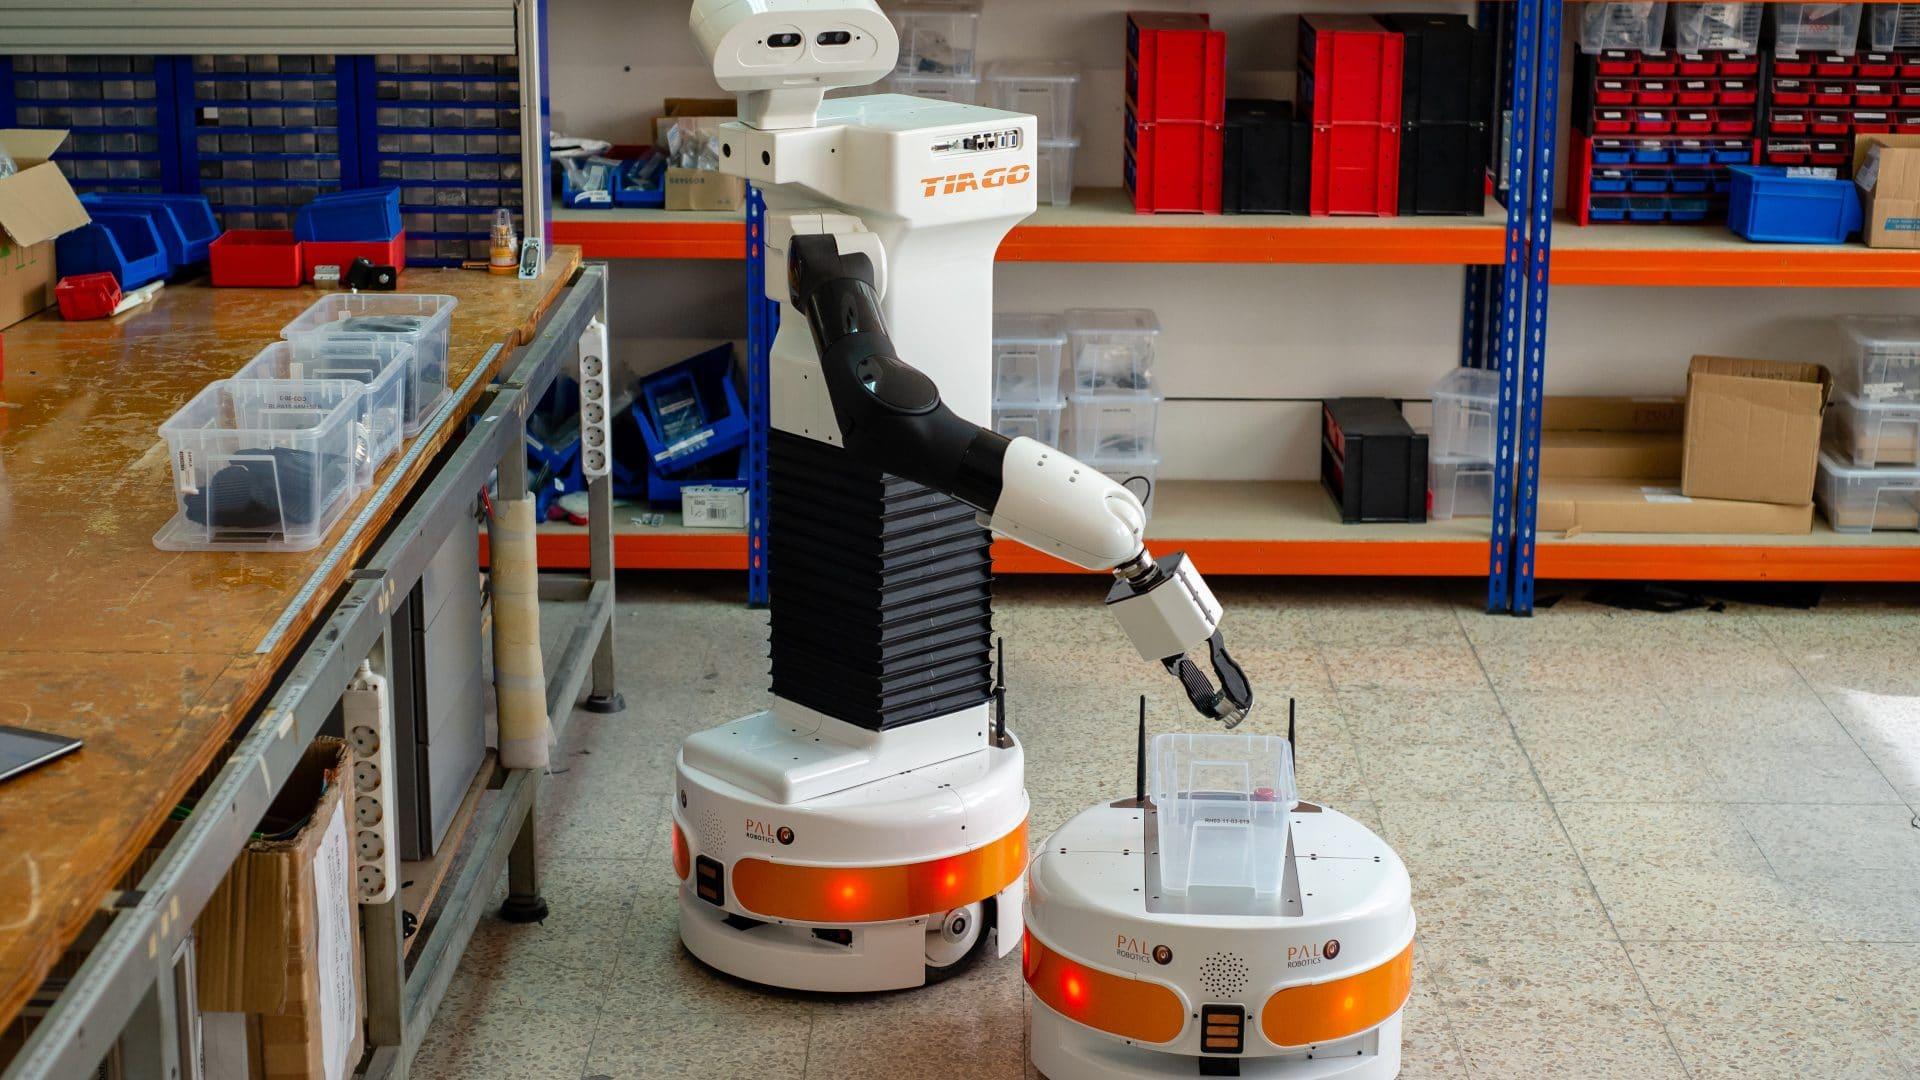 La industria avanza hacia la robótica colaborativa